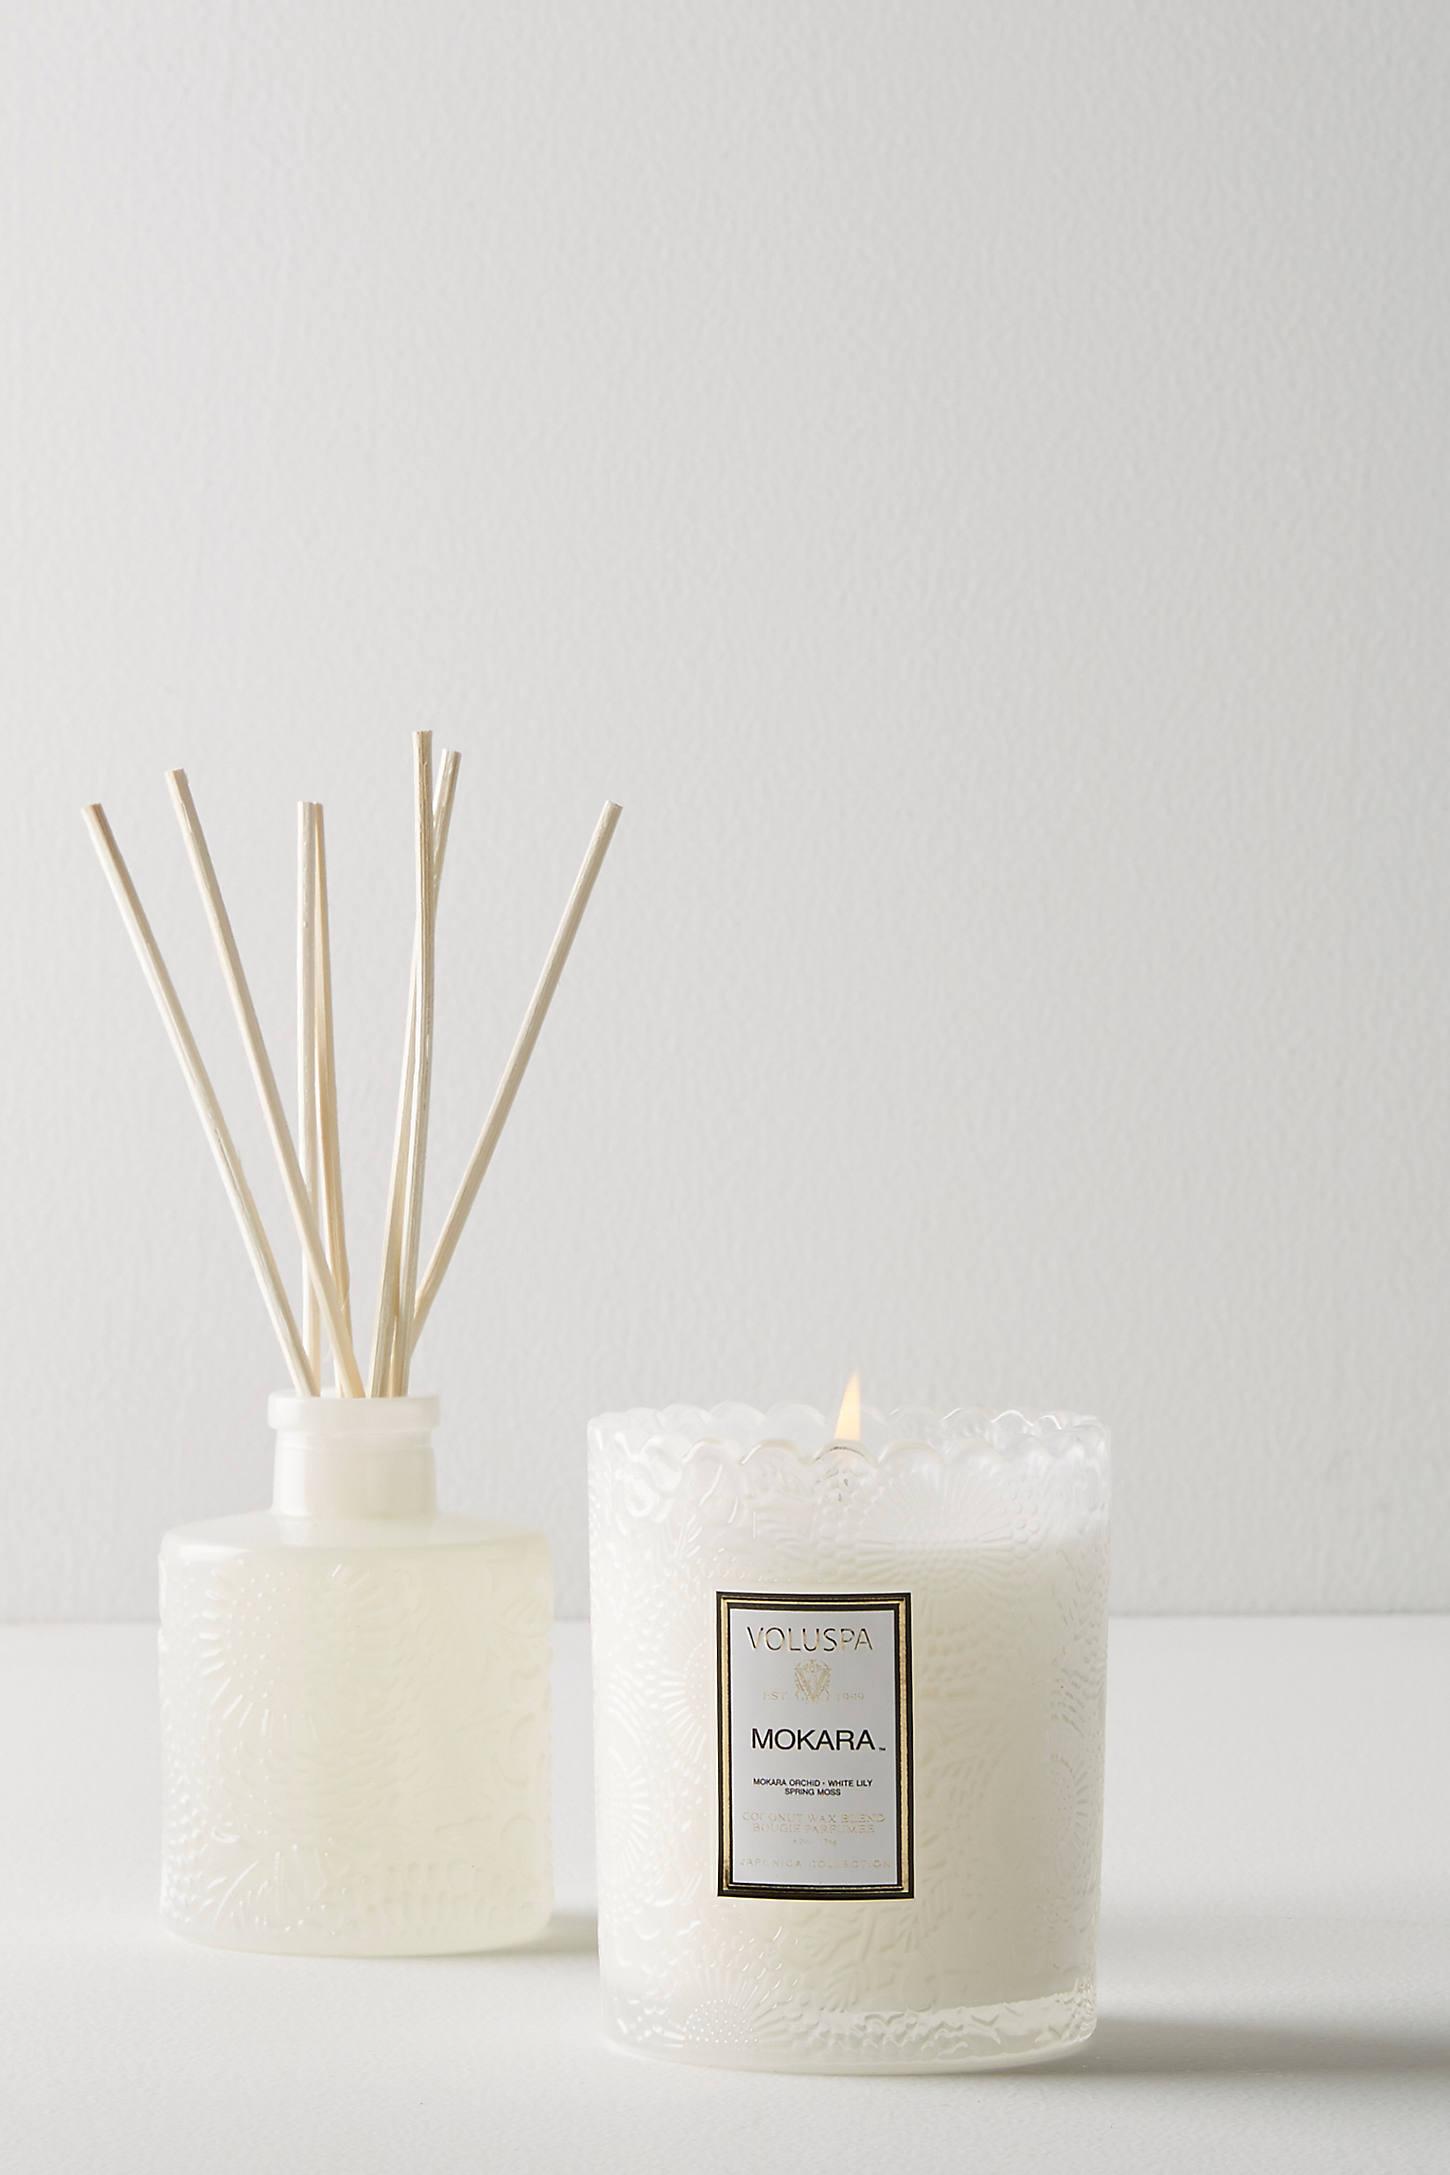 Voluspa Scalloped Edge Candle & Diffuser Gift Set